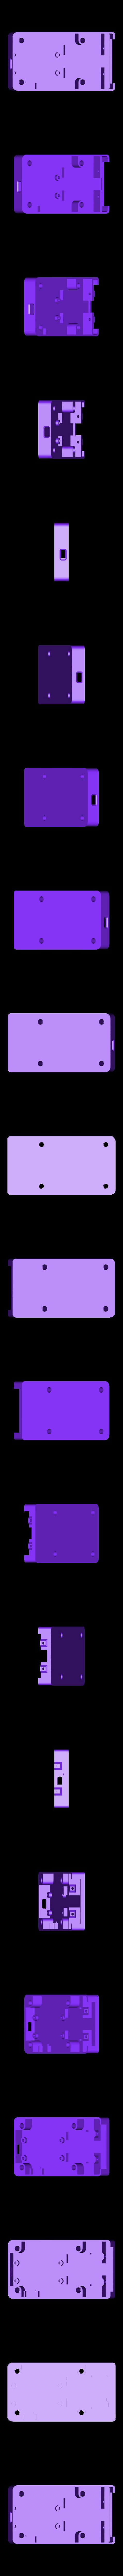 triser-case.stl Download free STL file NeoPixel LED Truck Riser for Skateboard Longboard • 3D printable object, Adafruit